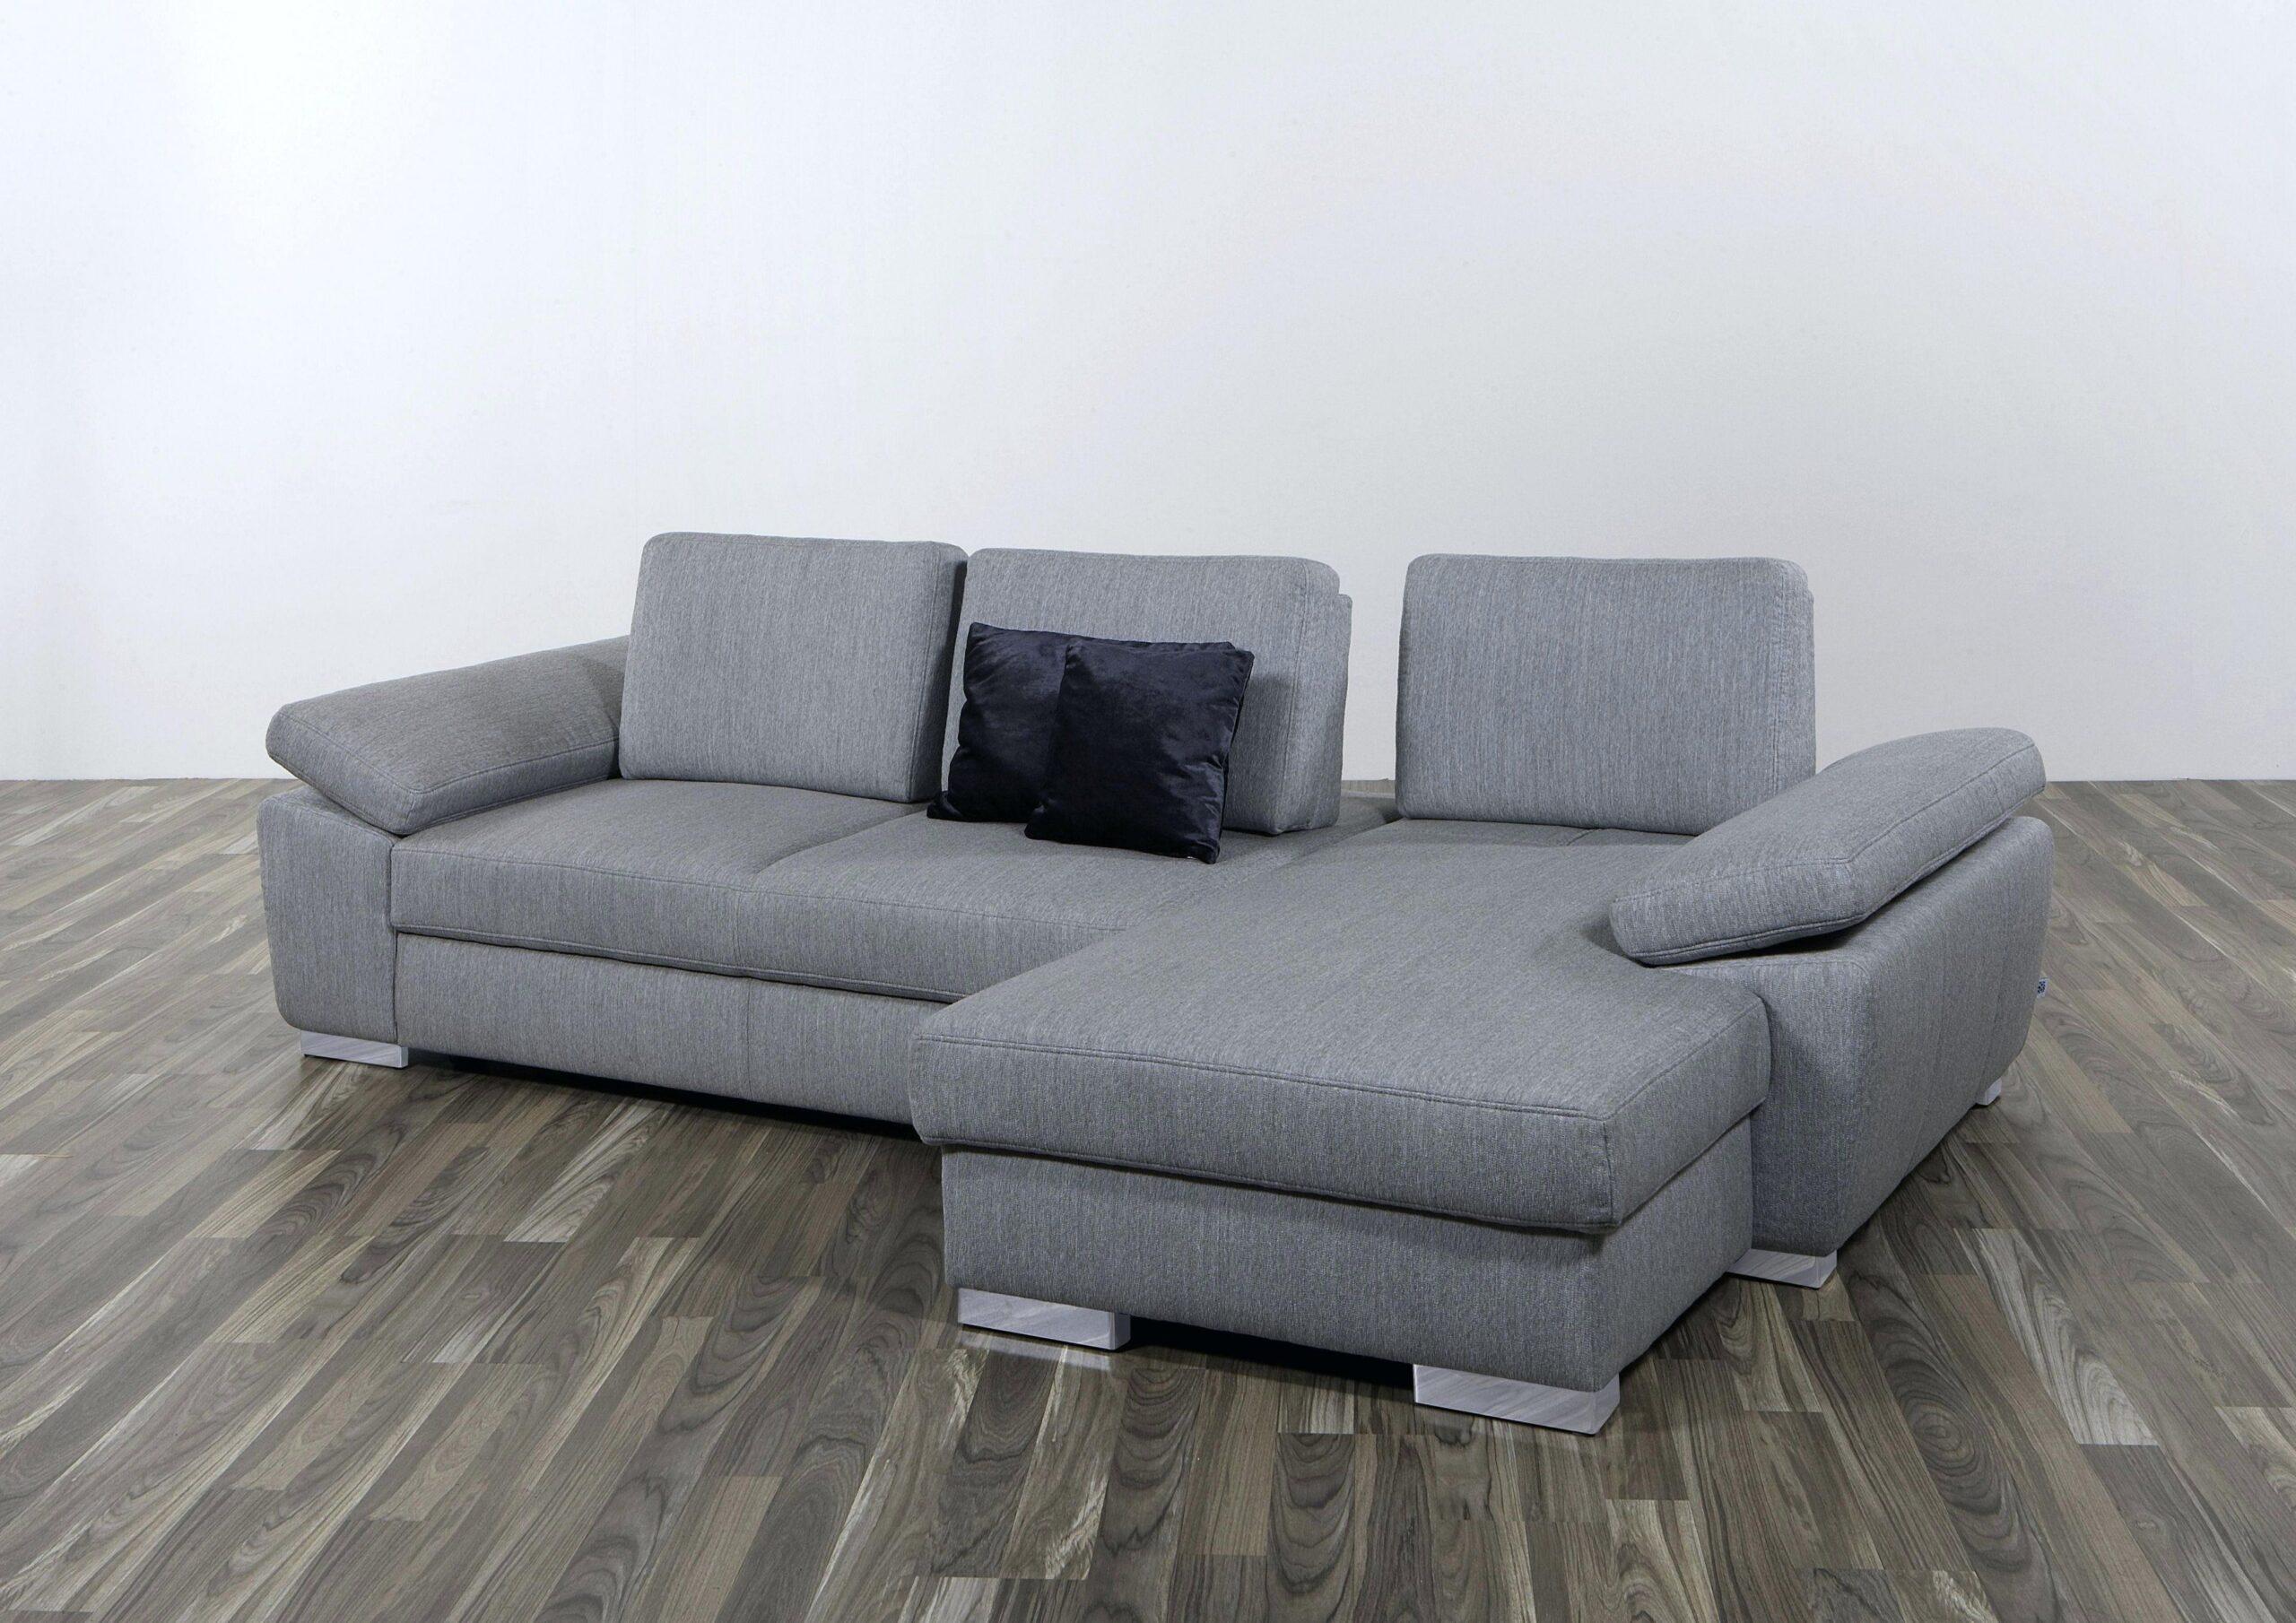 Full Size of Poco Couch Grau Weiay Full Size Of Big Sofa Creme Mit Holzfüßen Weißes Leder Schlafzimmer Komplett Alcantara Halbrund Blau Rundes Xxxl Kolonialstil Sofa Poco Big Sofa